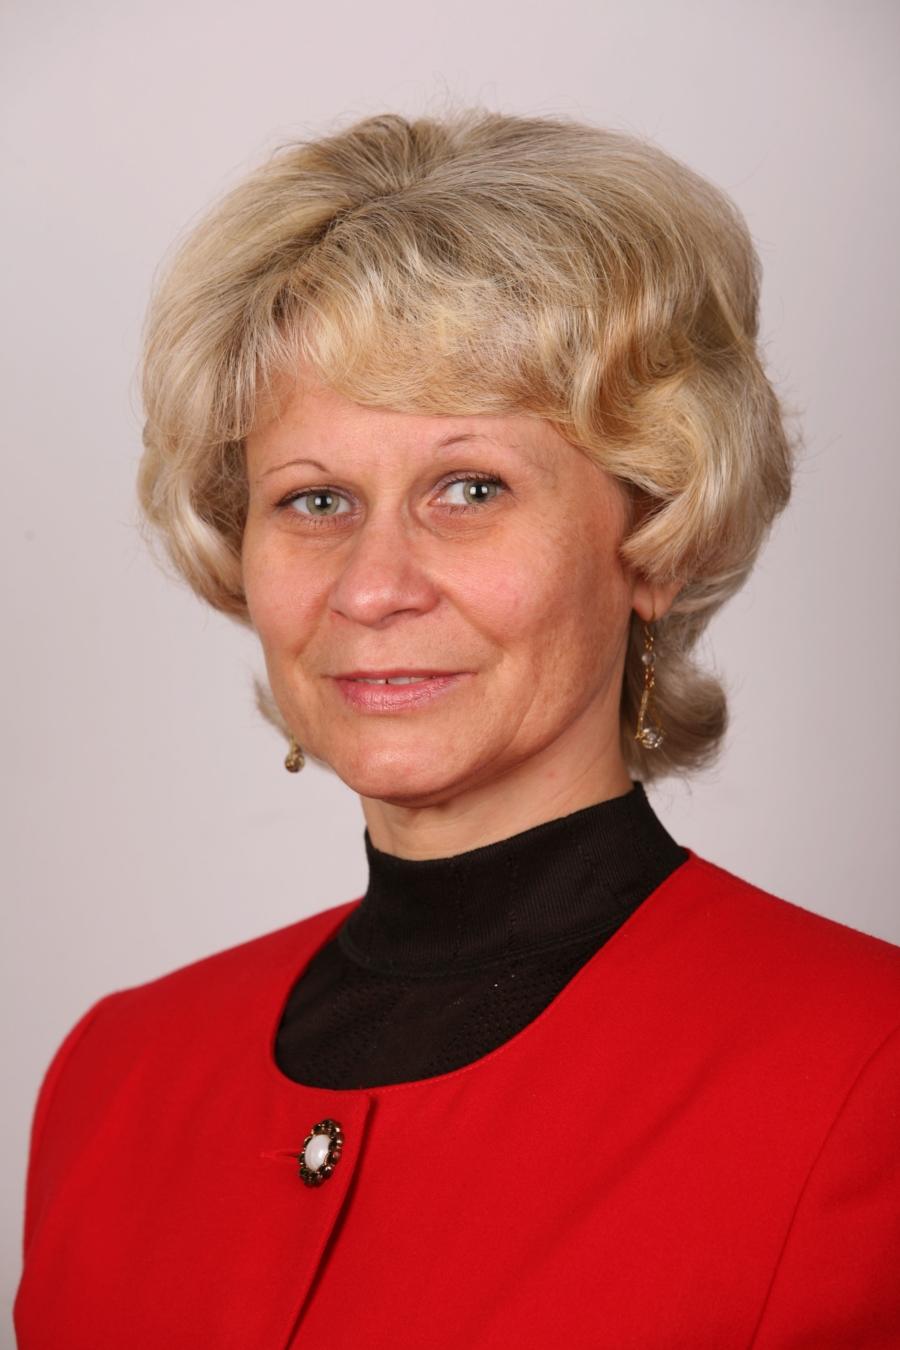 Barbara KoprowskaJPG